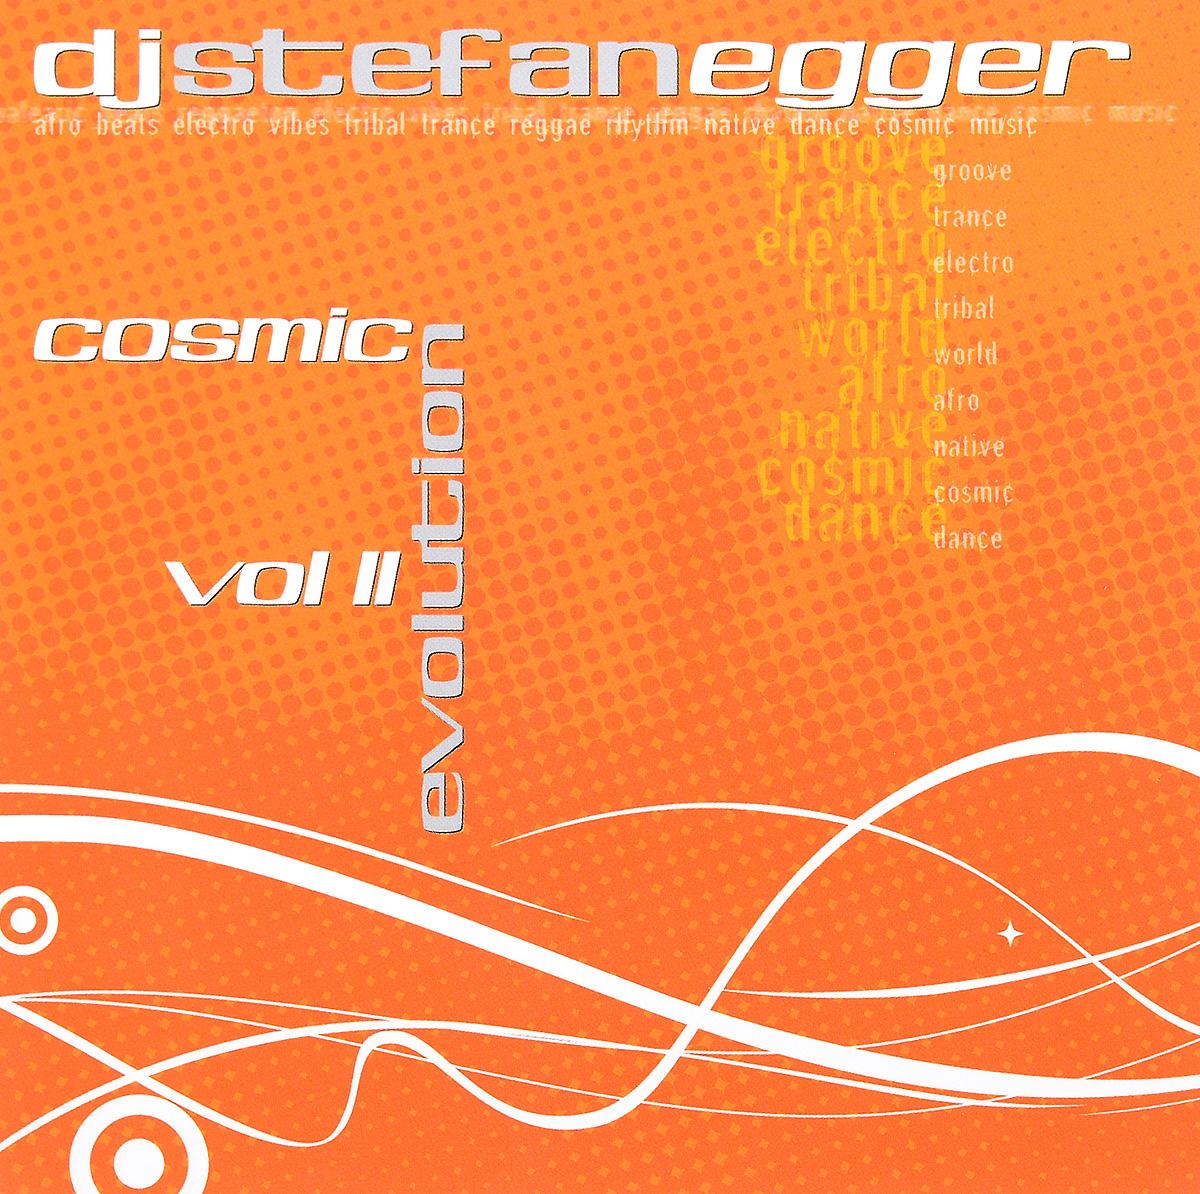 Stefan Egger / DJ Stefan Egger DJ Stefan Egger. Cosmic Evolution. Vol. II stefan egger dj stefan egger dj stefan egger cosmic evolution